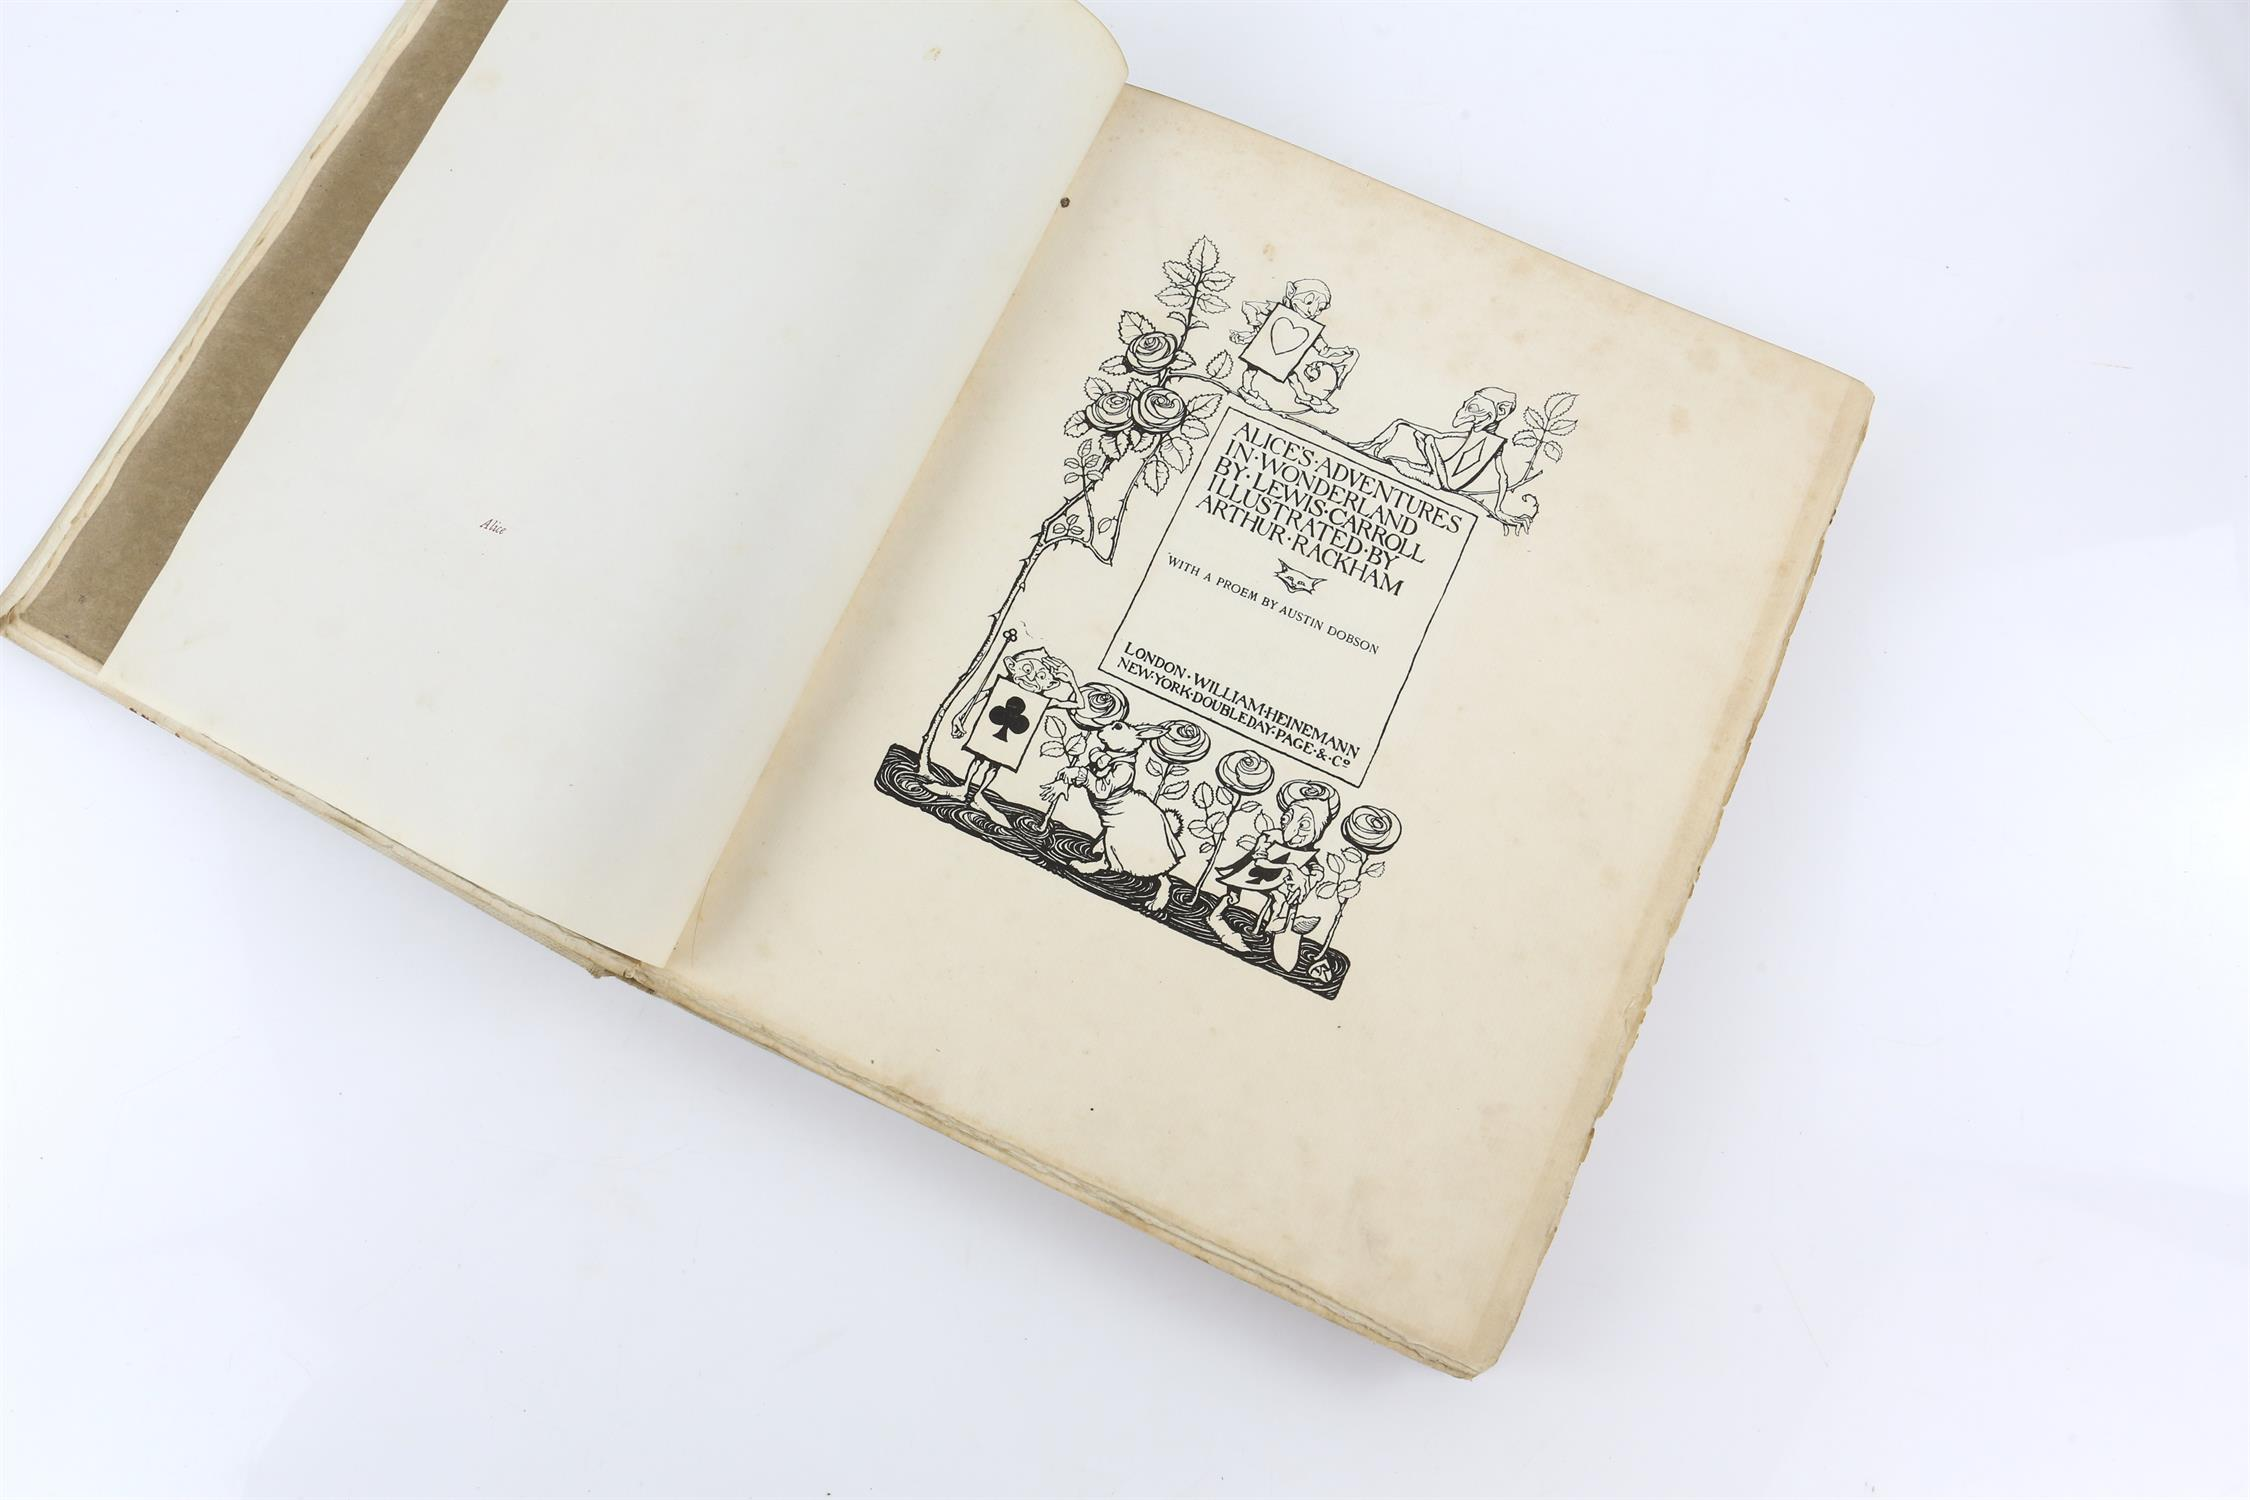 Carroll, Lewis, Alice's Adventures in Wonderland, illustrated by Arthur Rackham.W.Heinemann, - Image 17 of 17